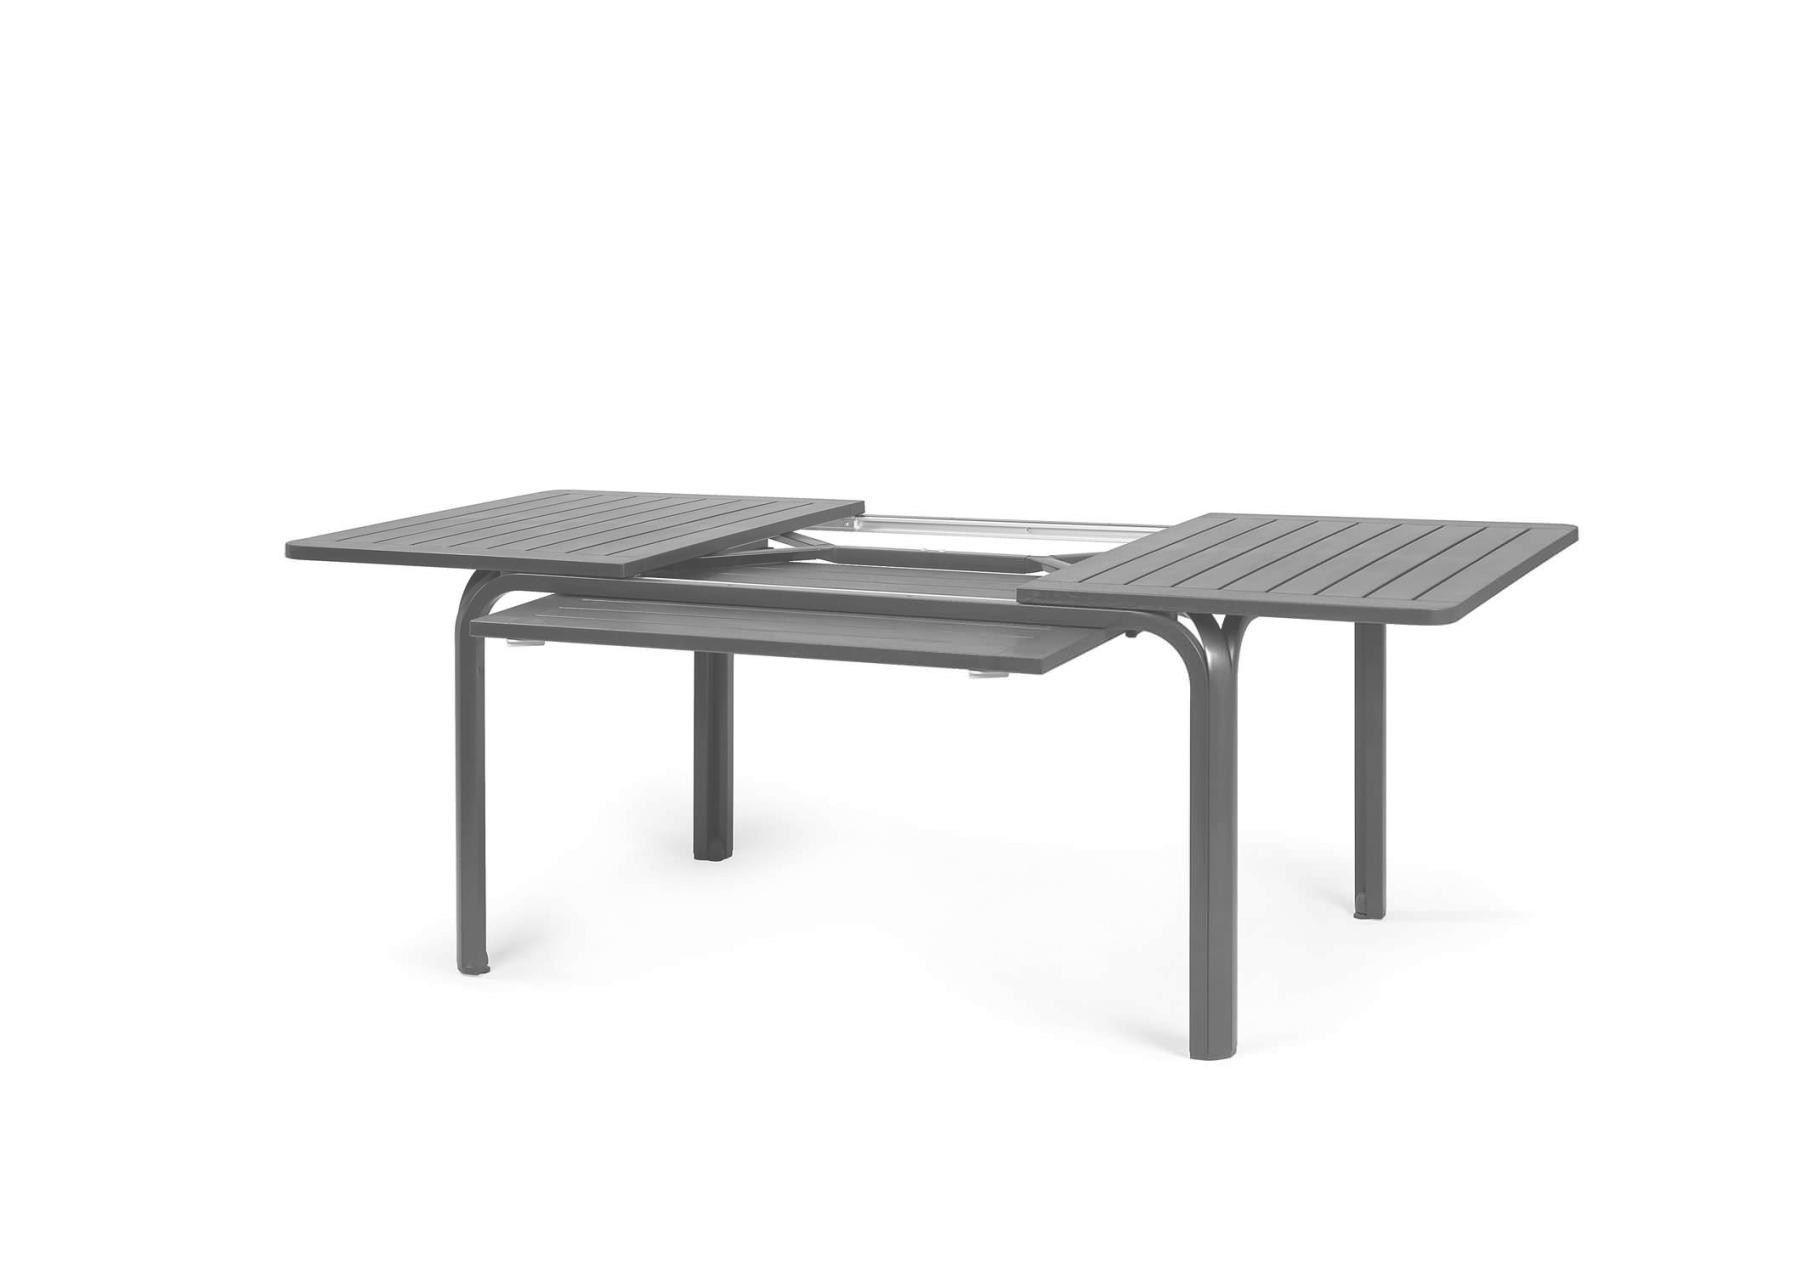 15 Amusant Table De Jardin Pliante Carrefour Pics Reupholster Furniture Cool Furniture Transforming Furniture